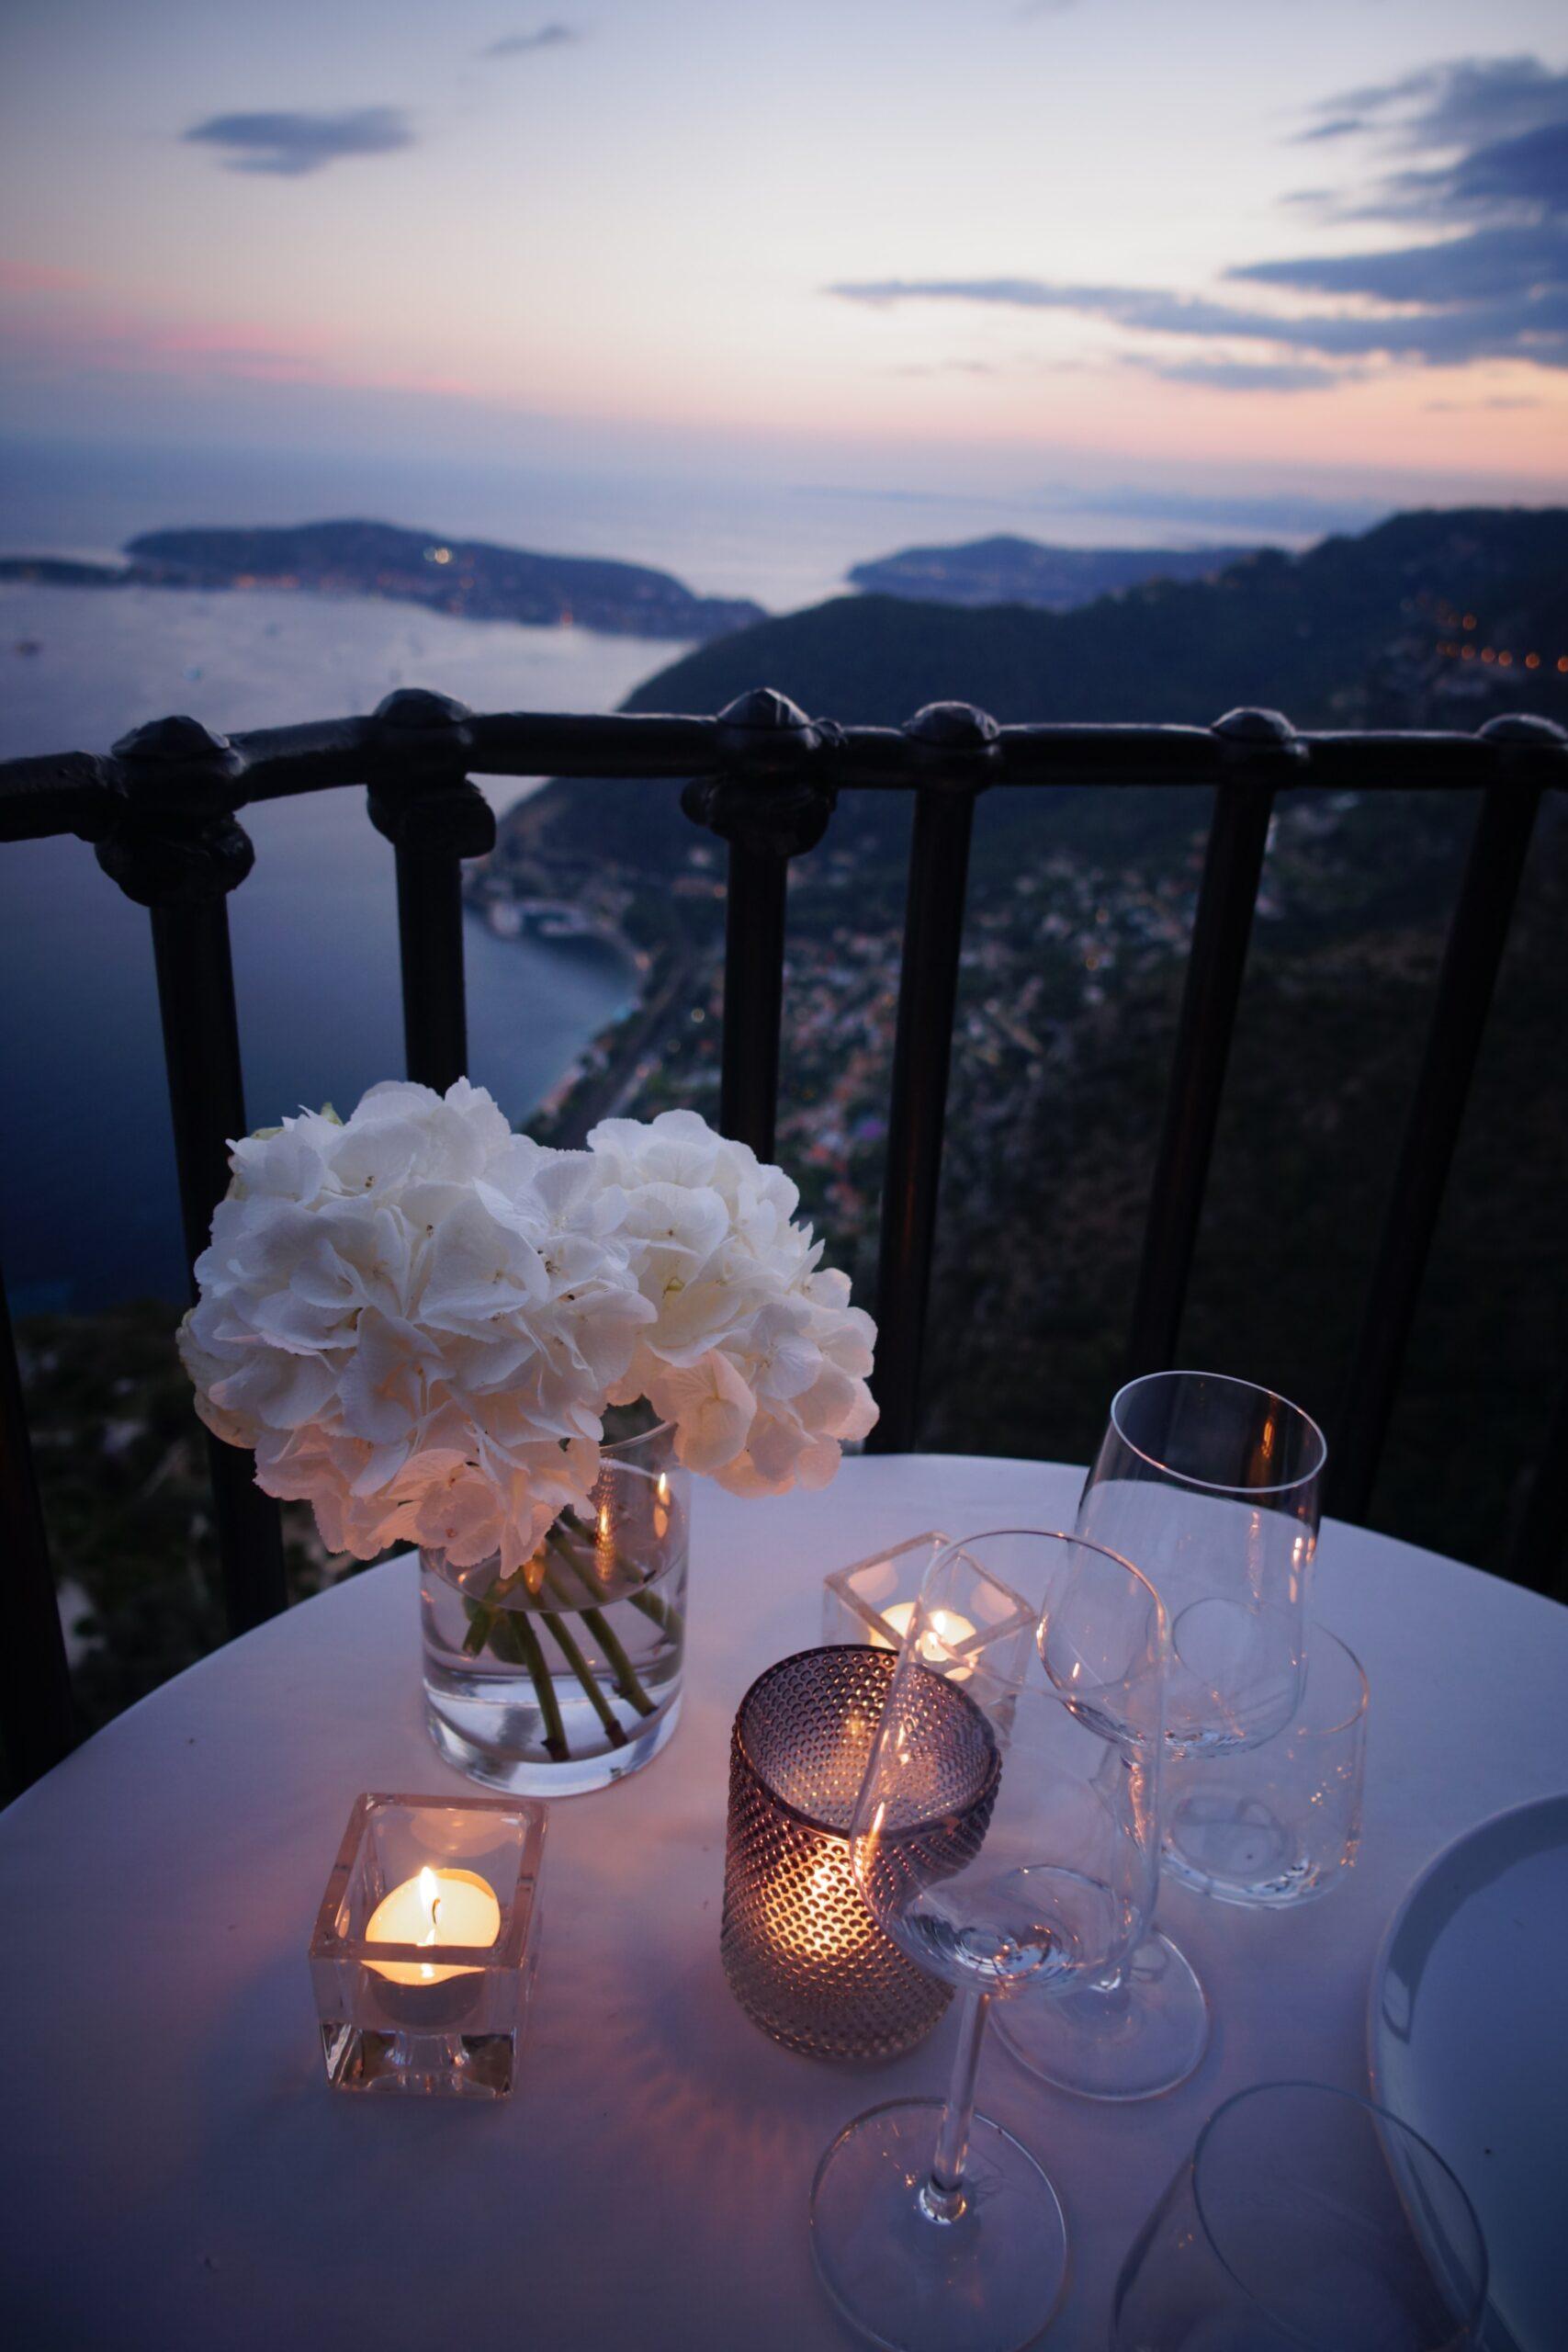 Weekend Romantico in Riviera: come renderlo indimenticabile